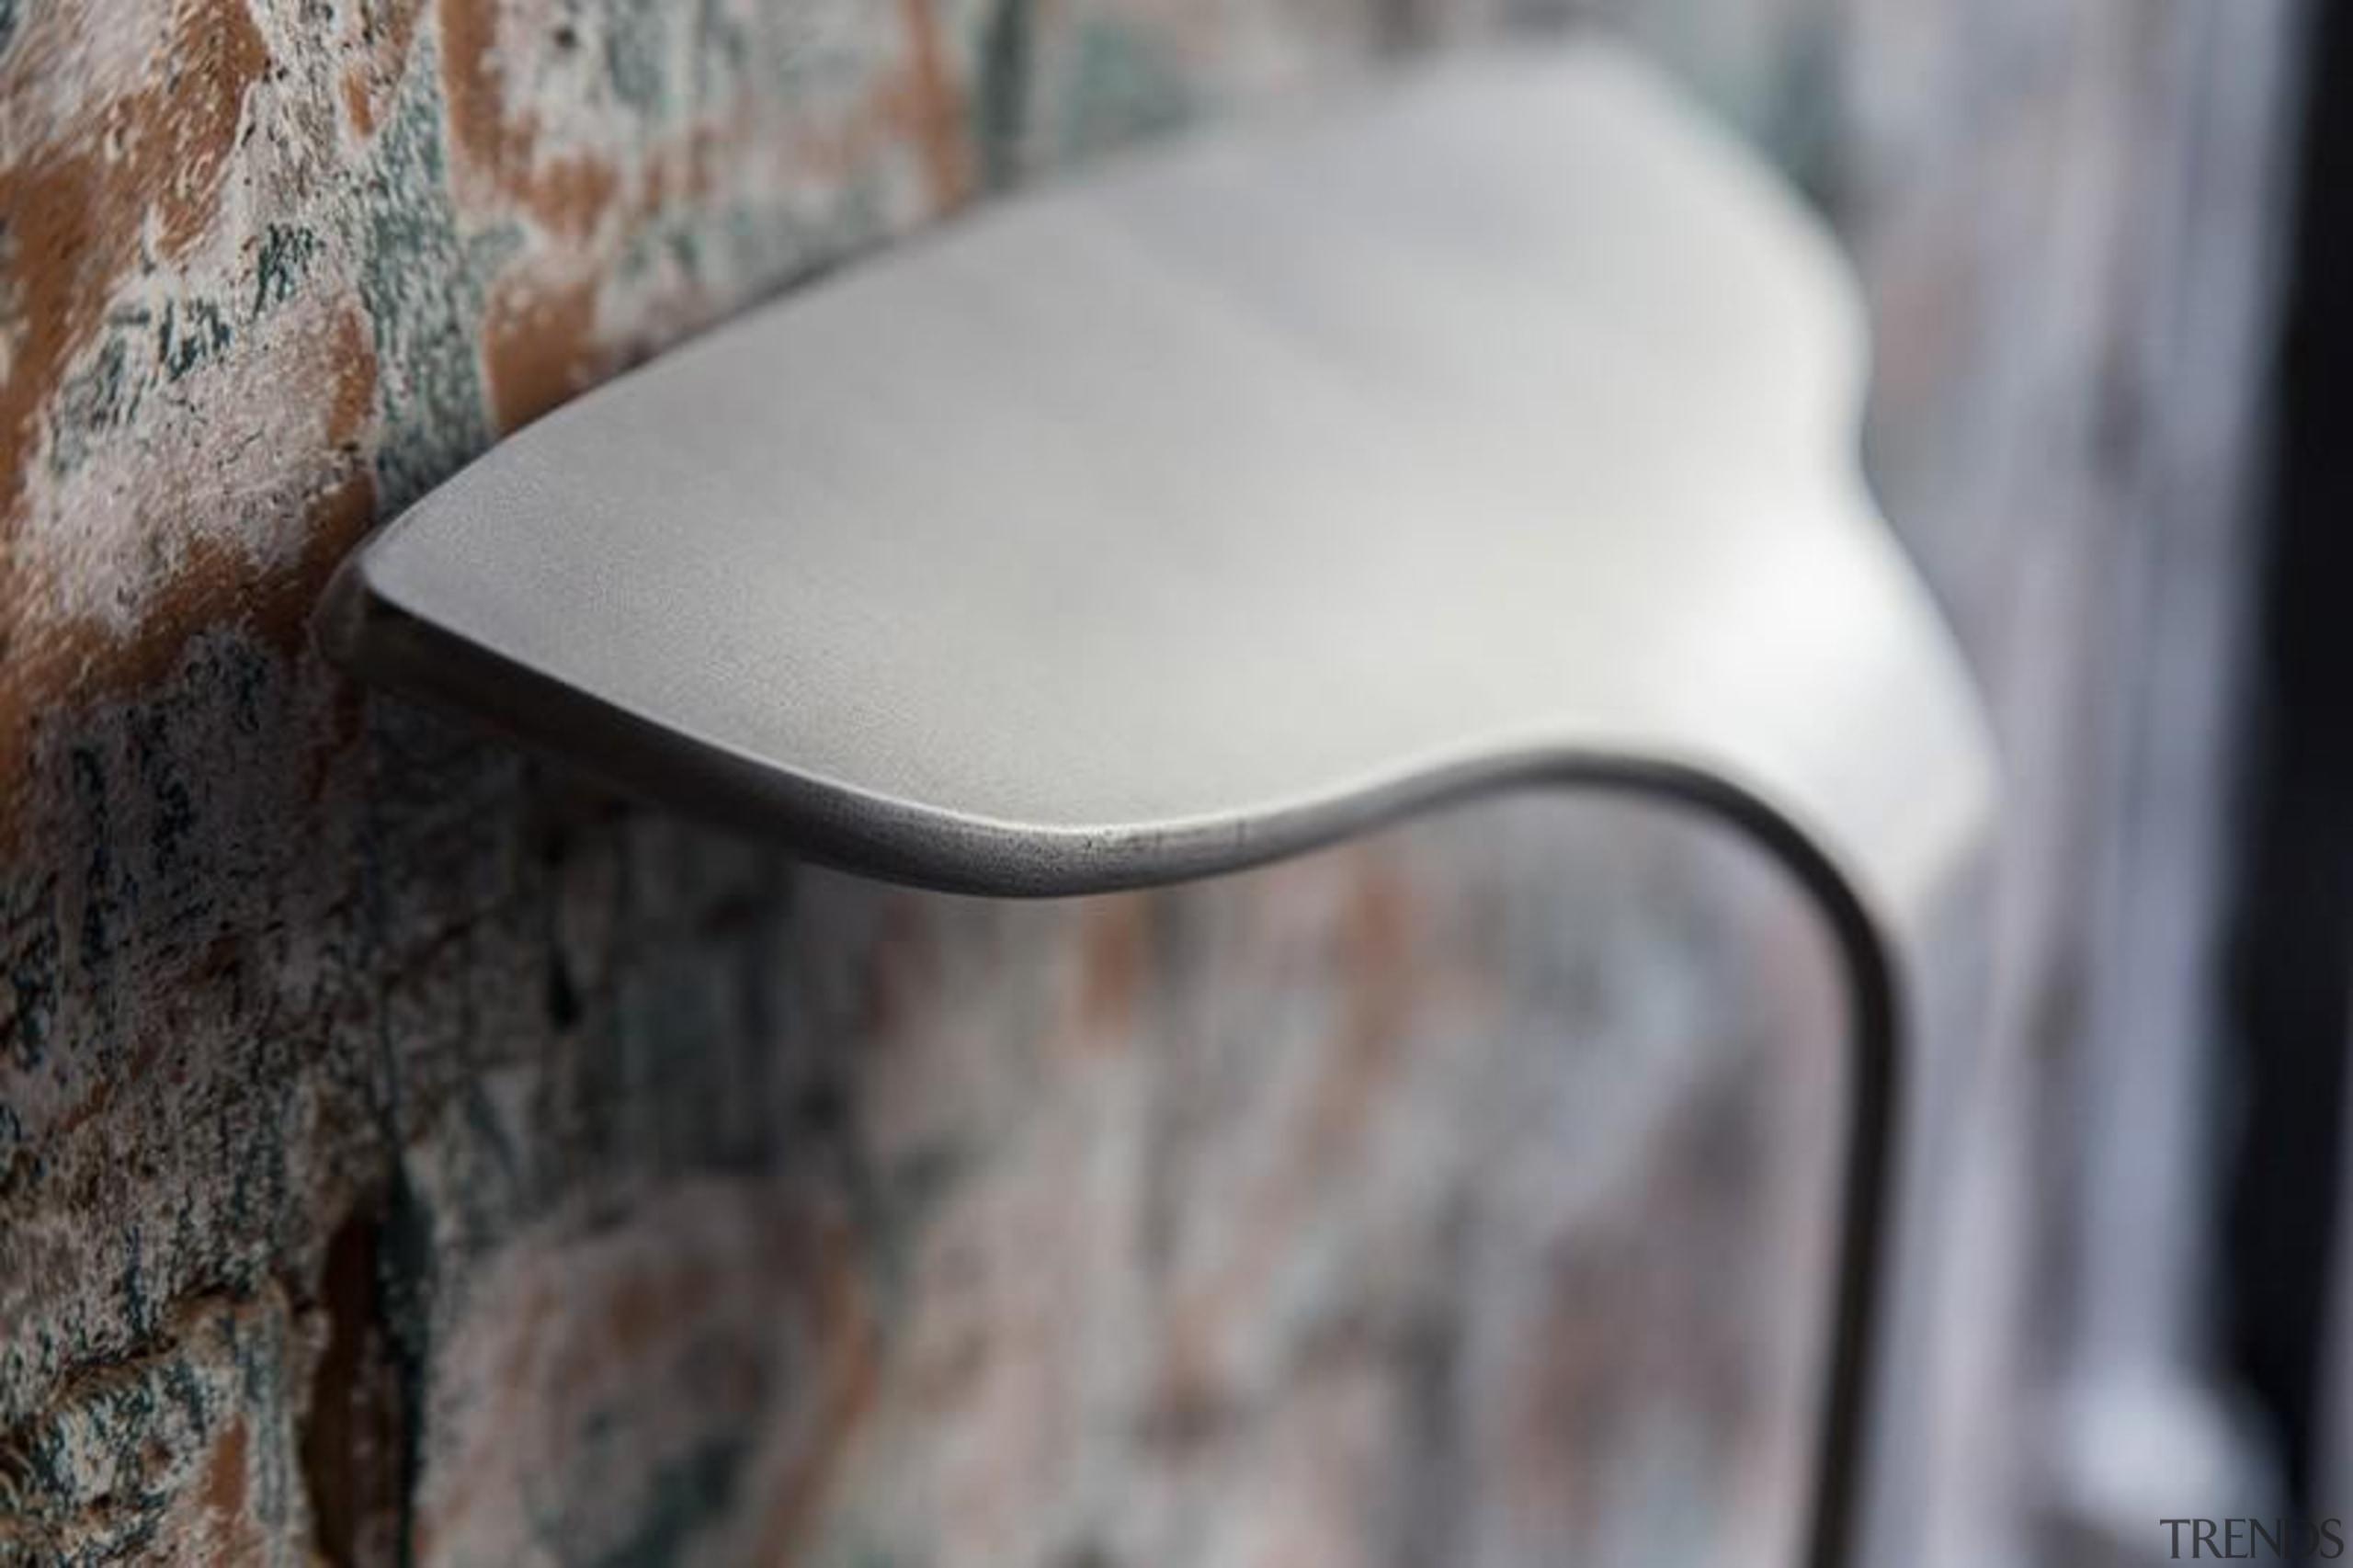 Czech Designer Petr Badura has created this unique wood, gray